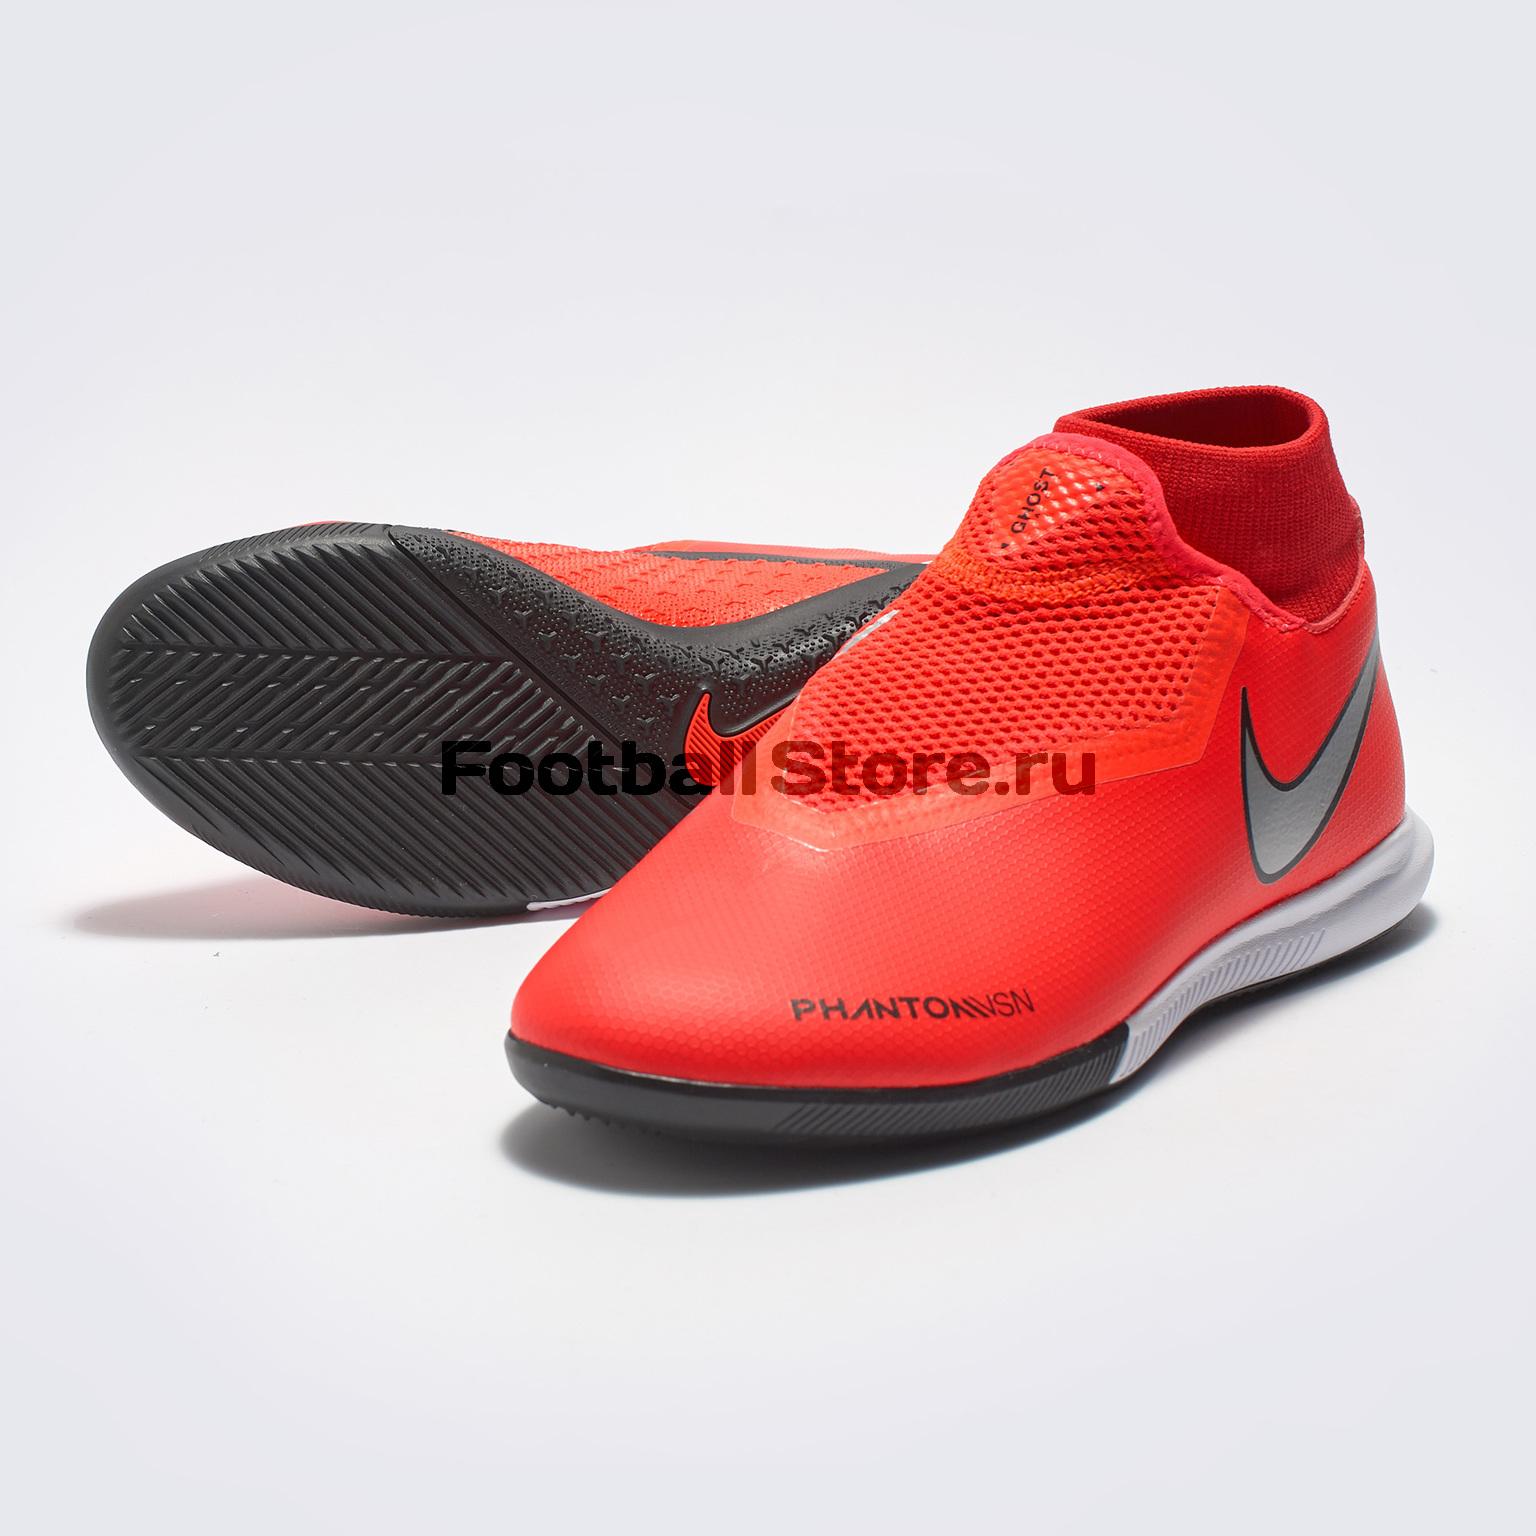 Футзалки Nike Phantom Vision Academy DF IC AO3267-600 бутсы детские nike phantom vision academy df sg aq9298 400